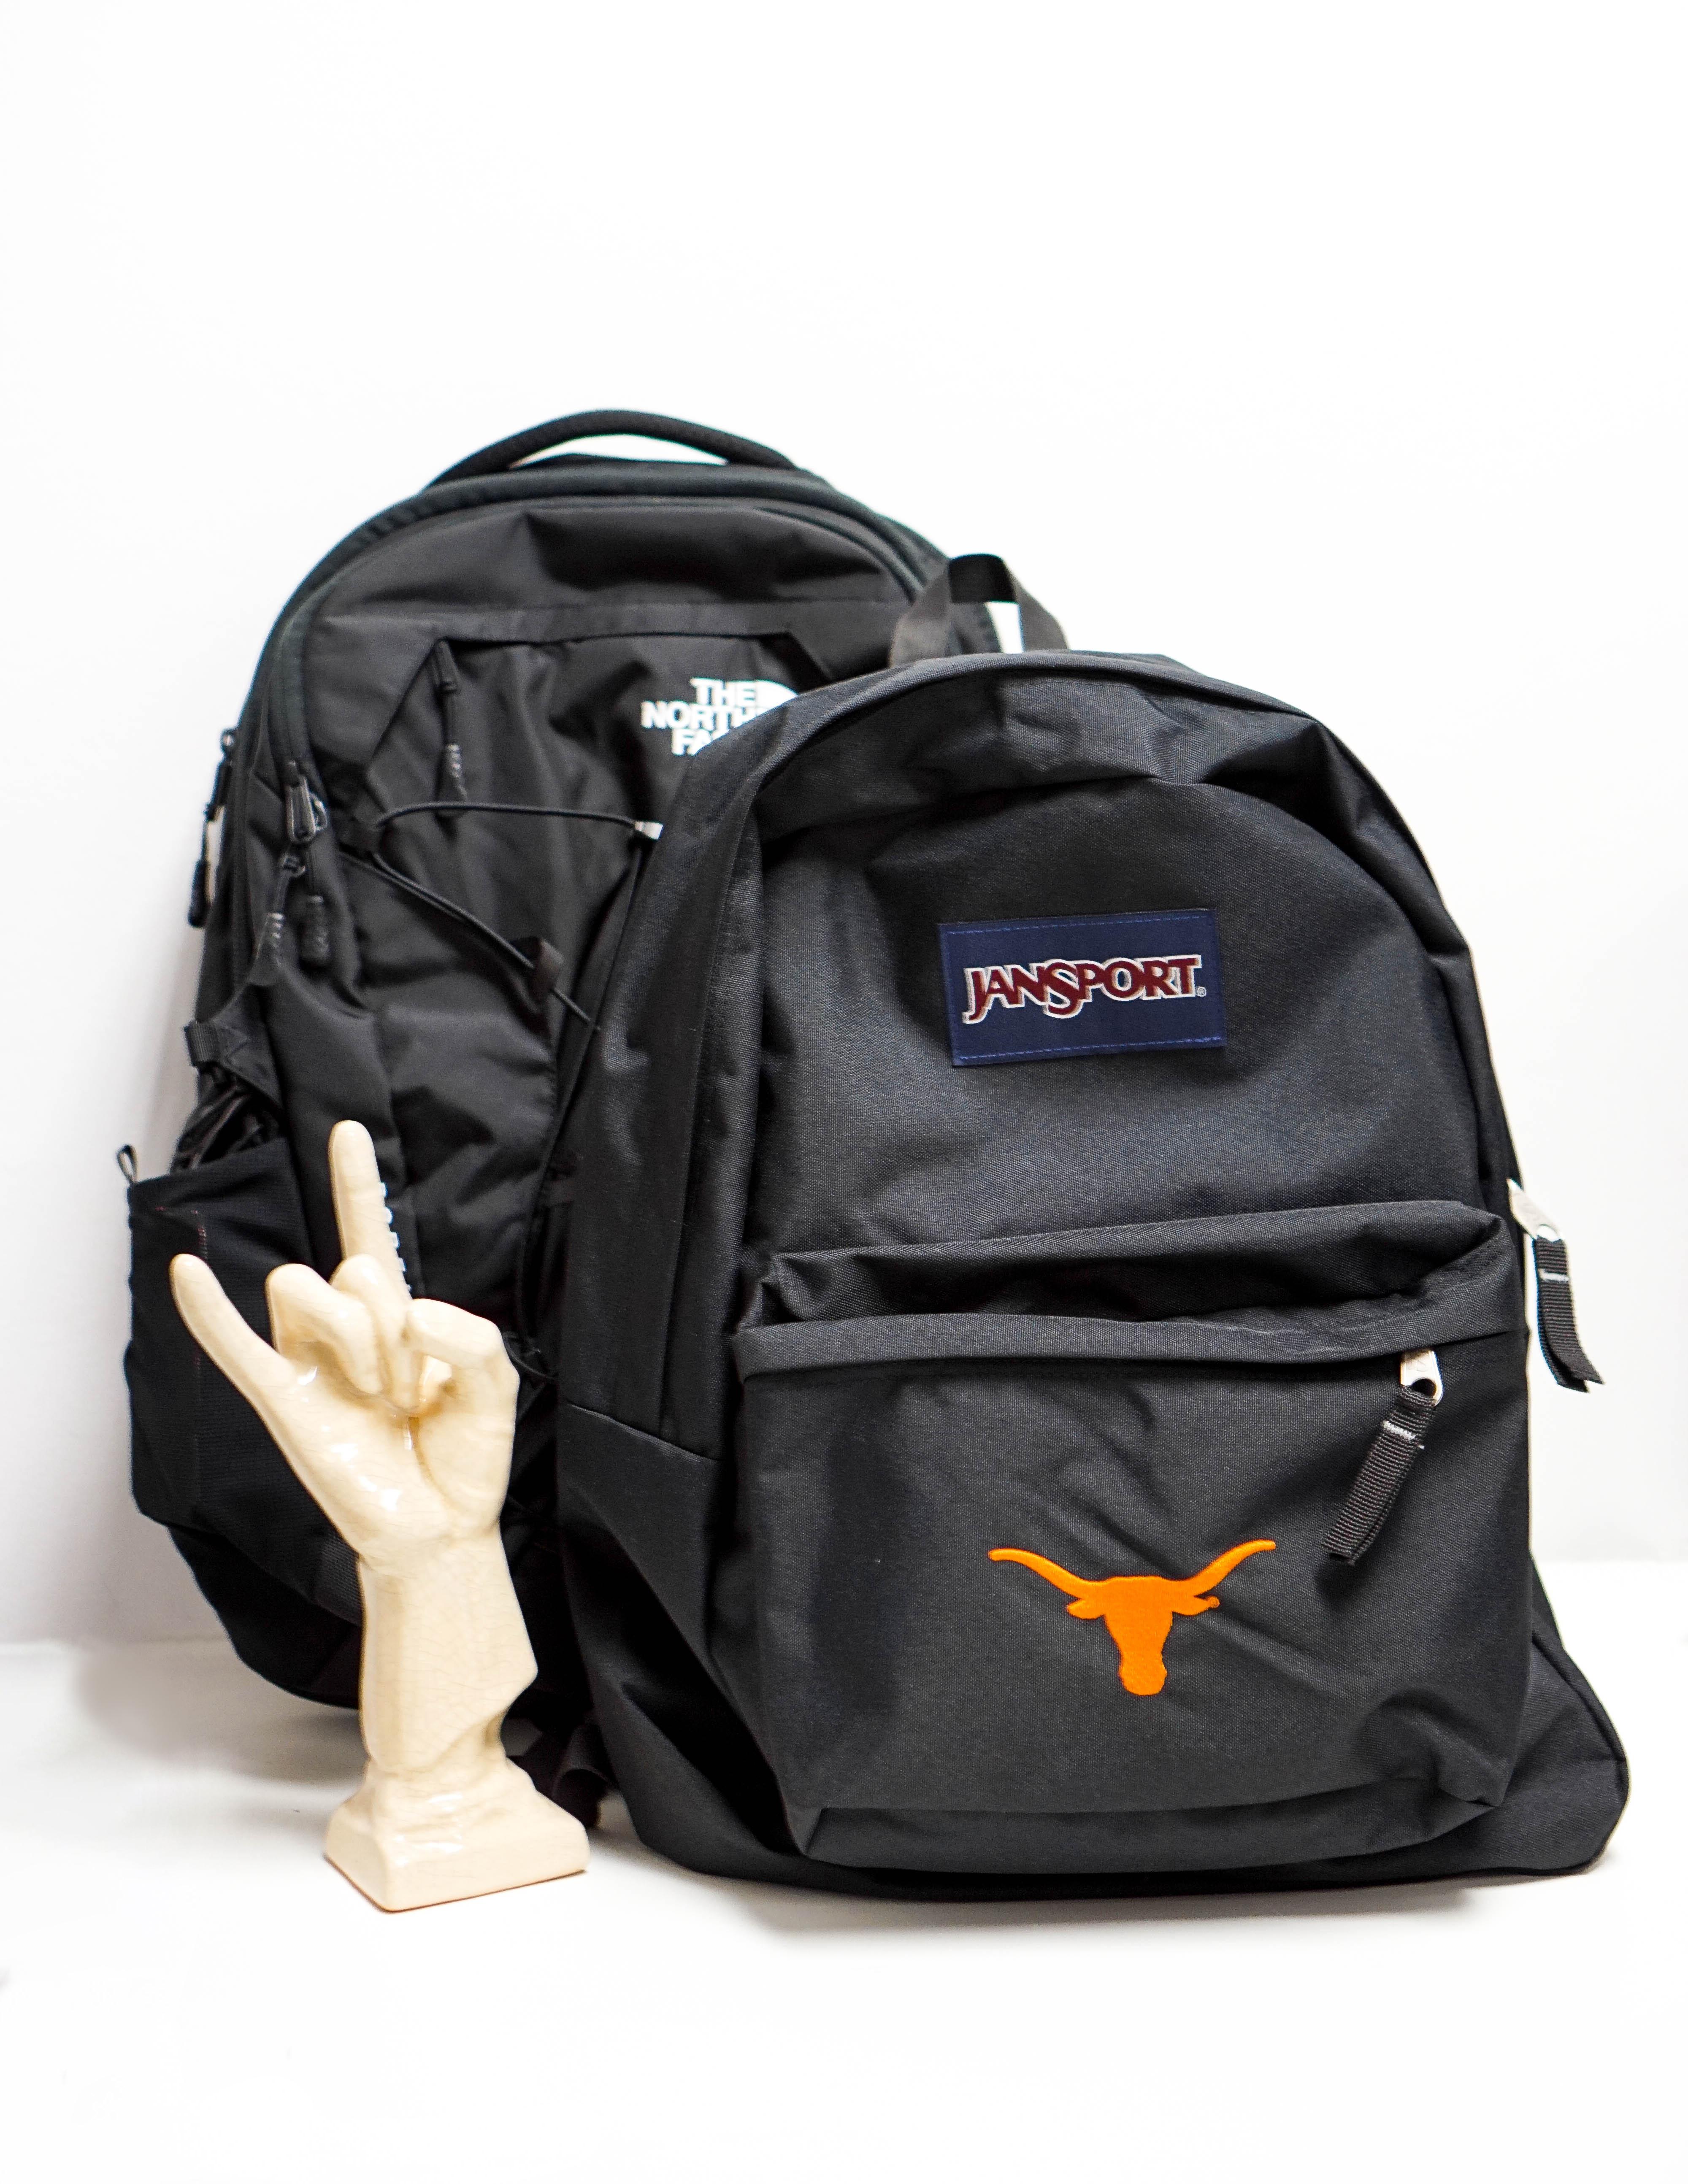 Two Backpacks On Desk